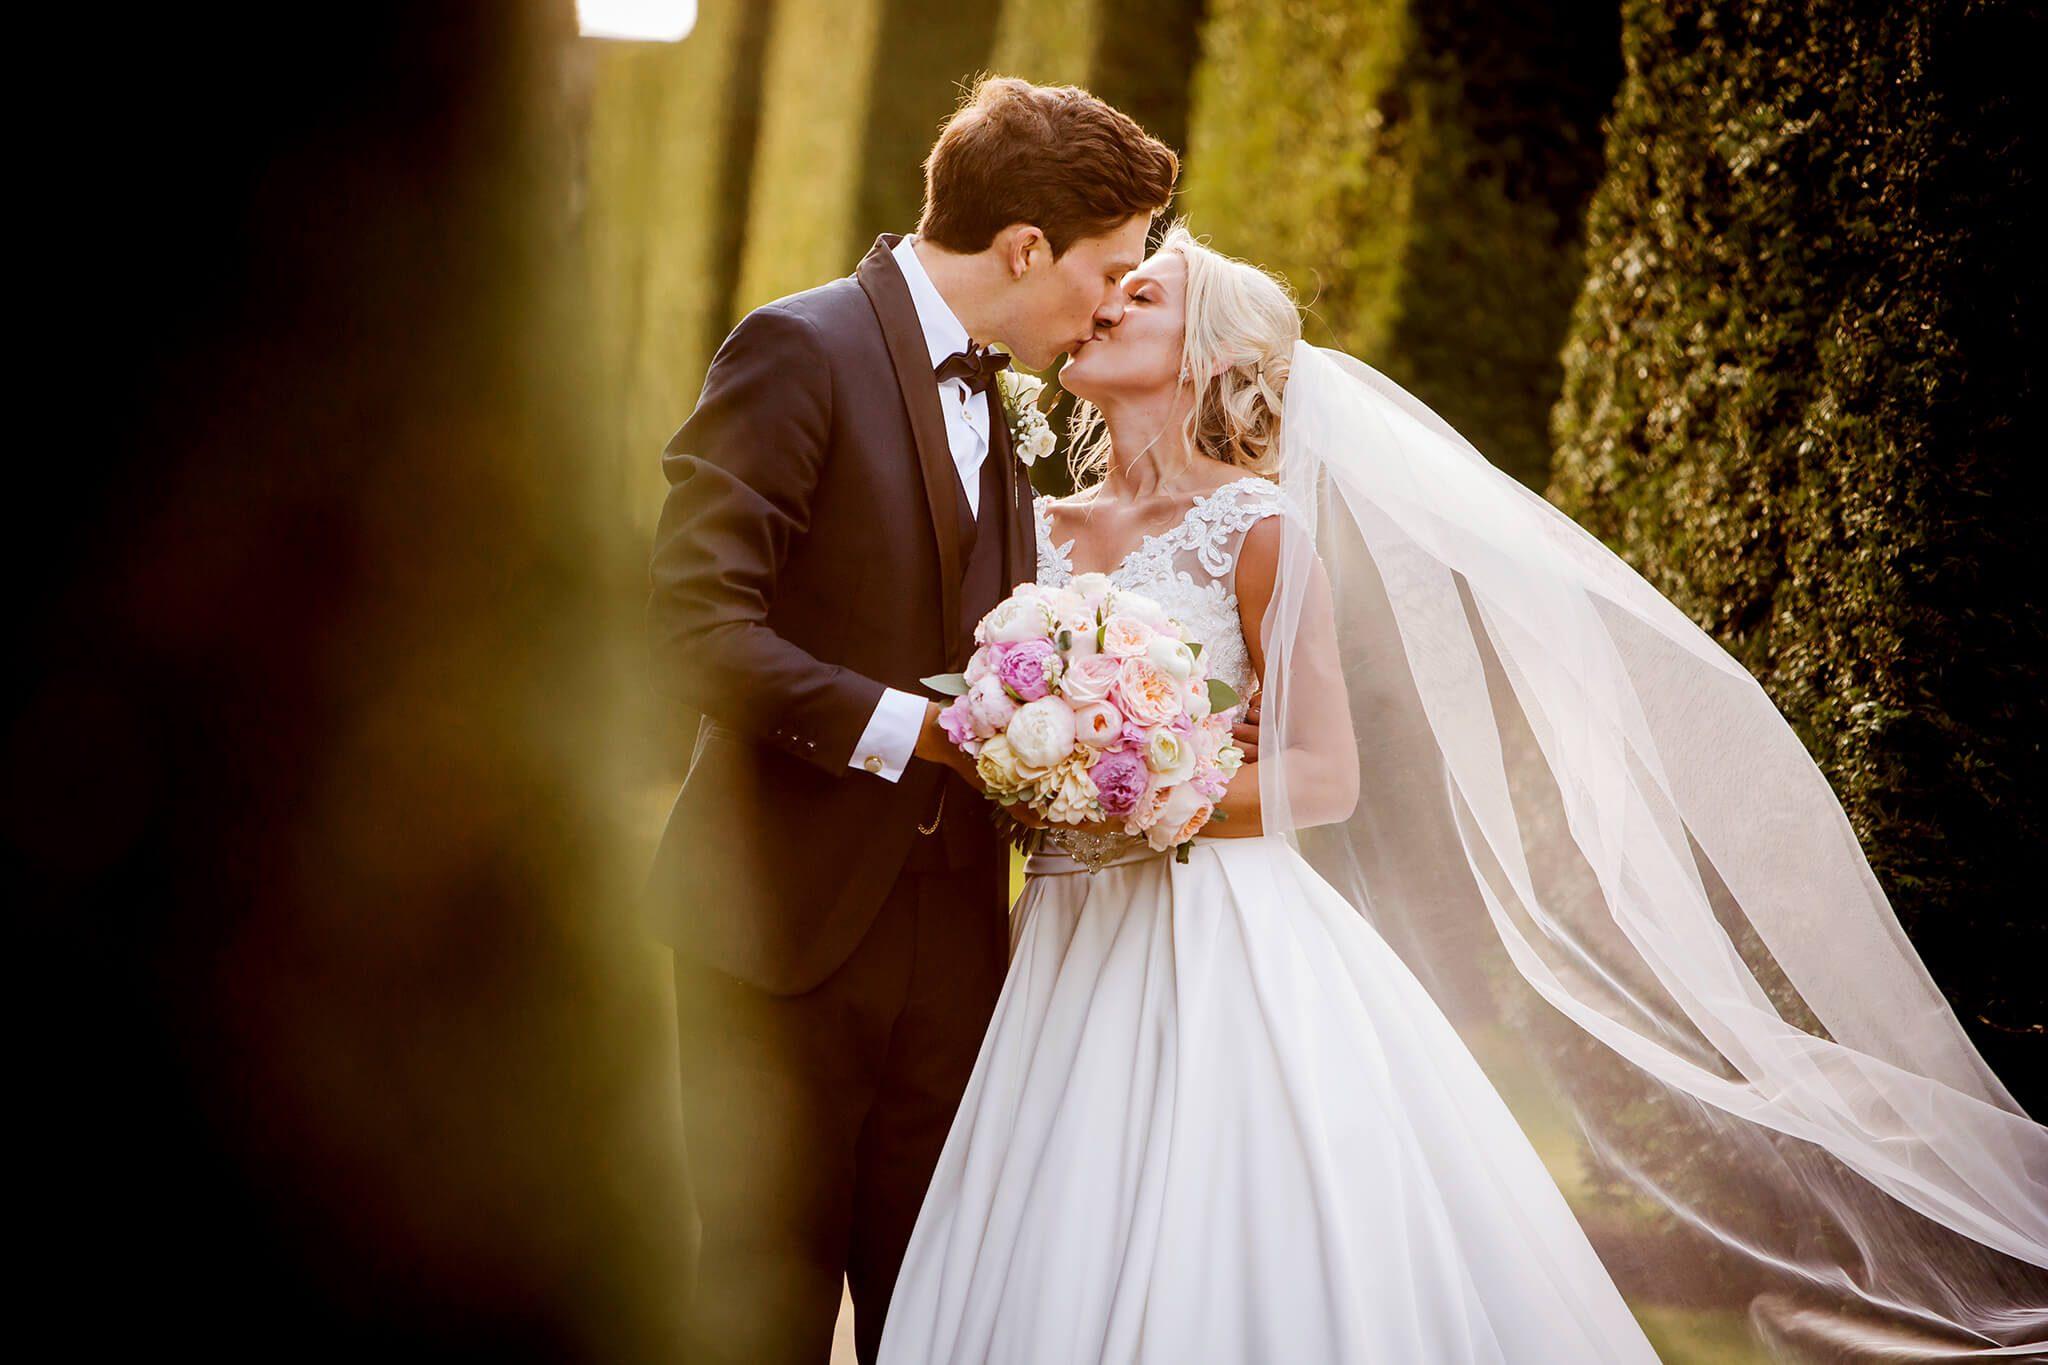 hoghton-tower-wedding-photographer-stanbury-photography-021a